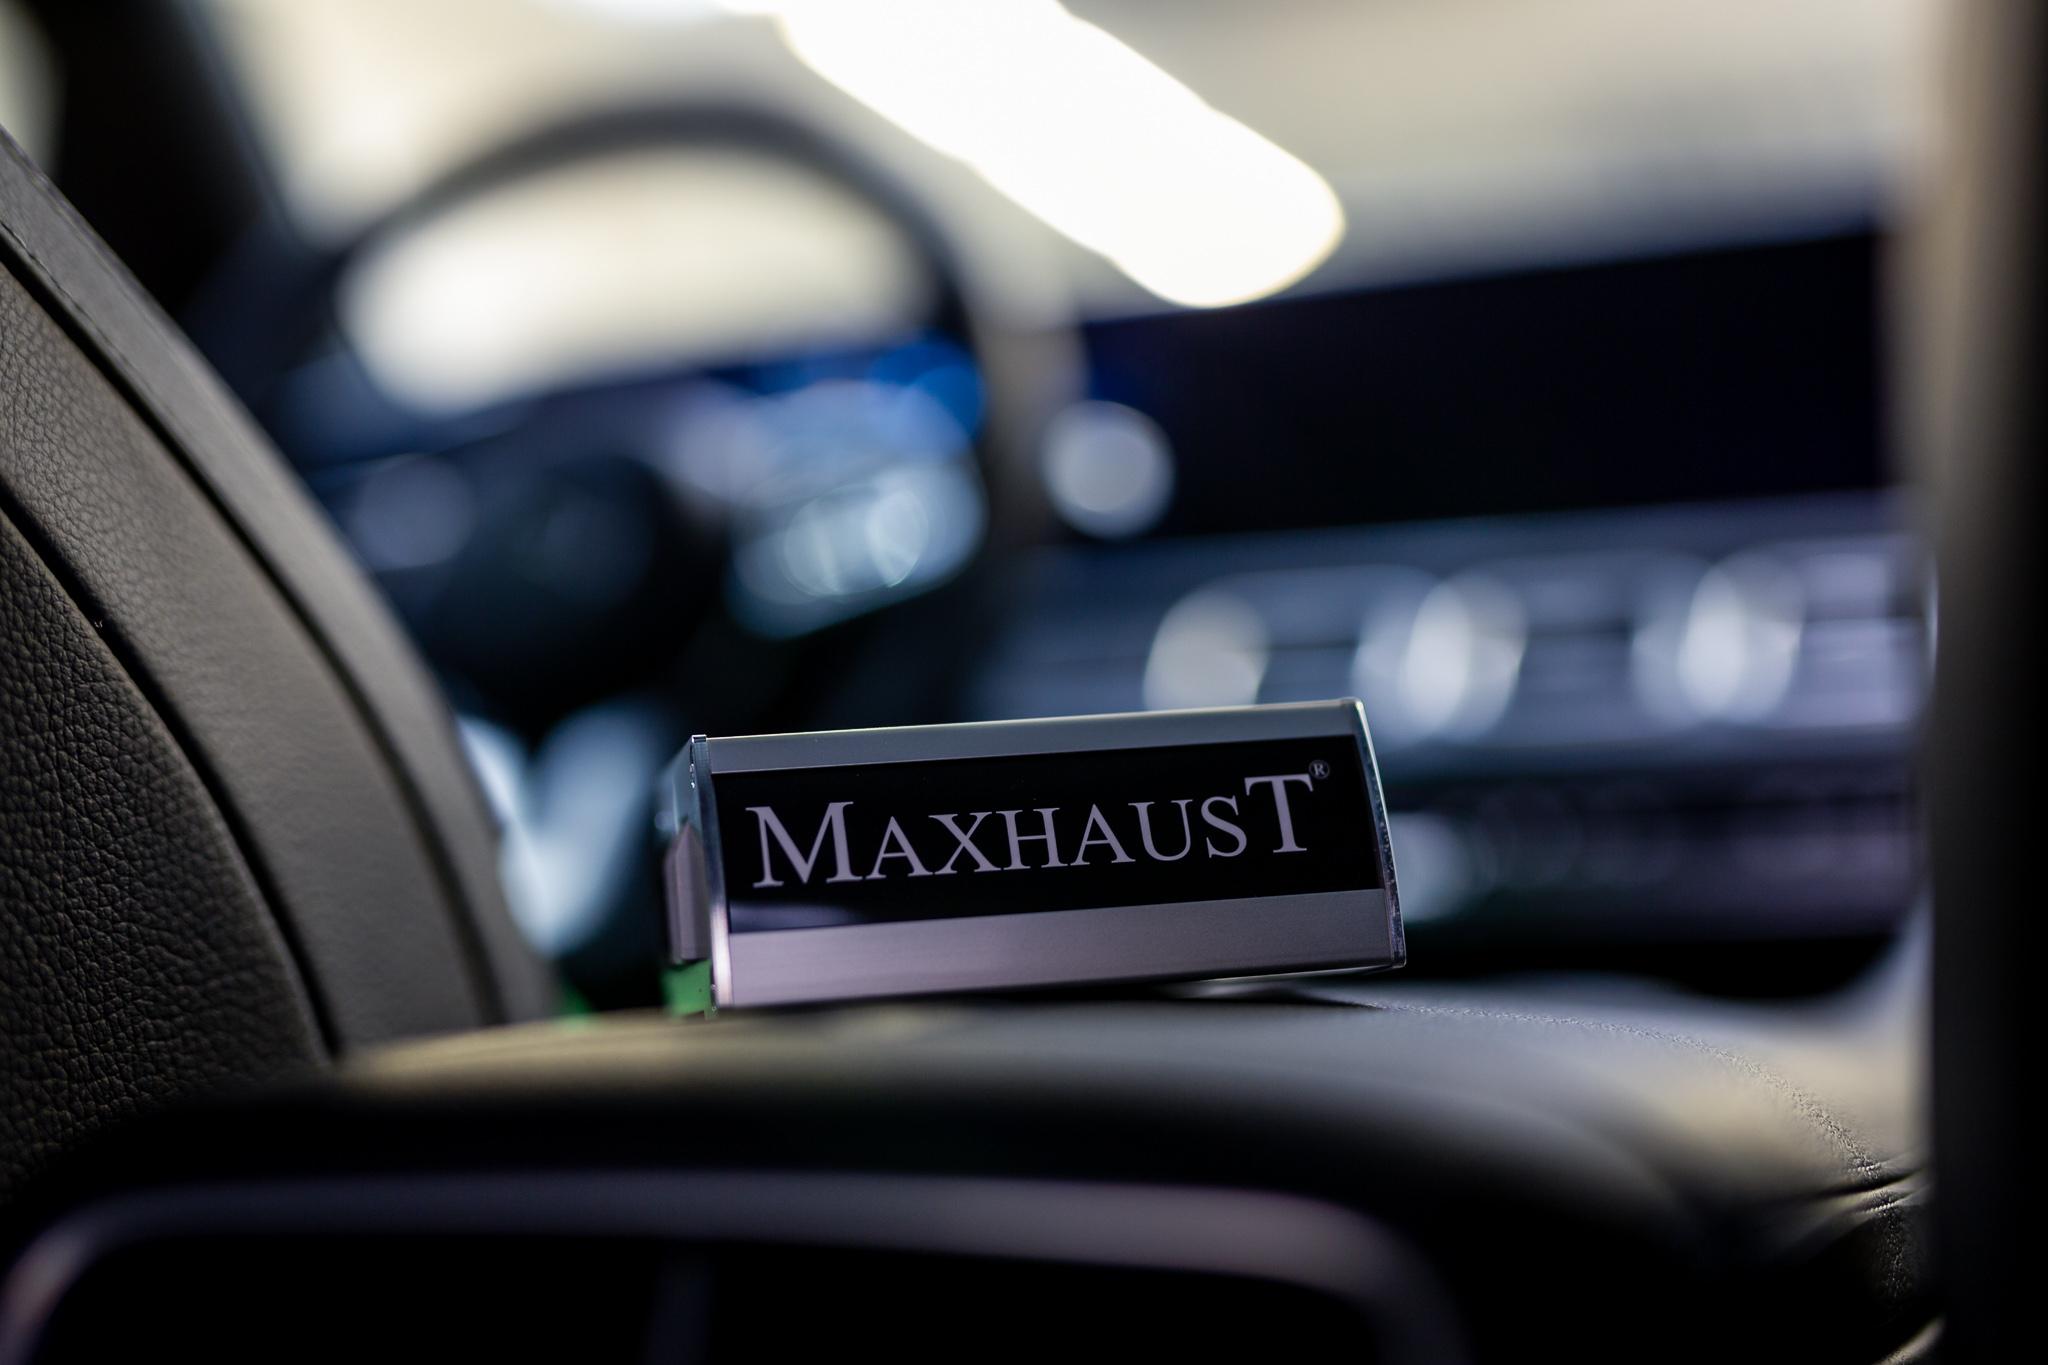 Mercedes GLE Maxhaust